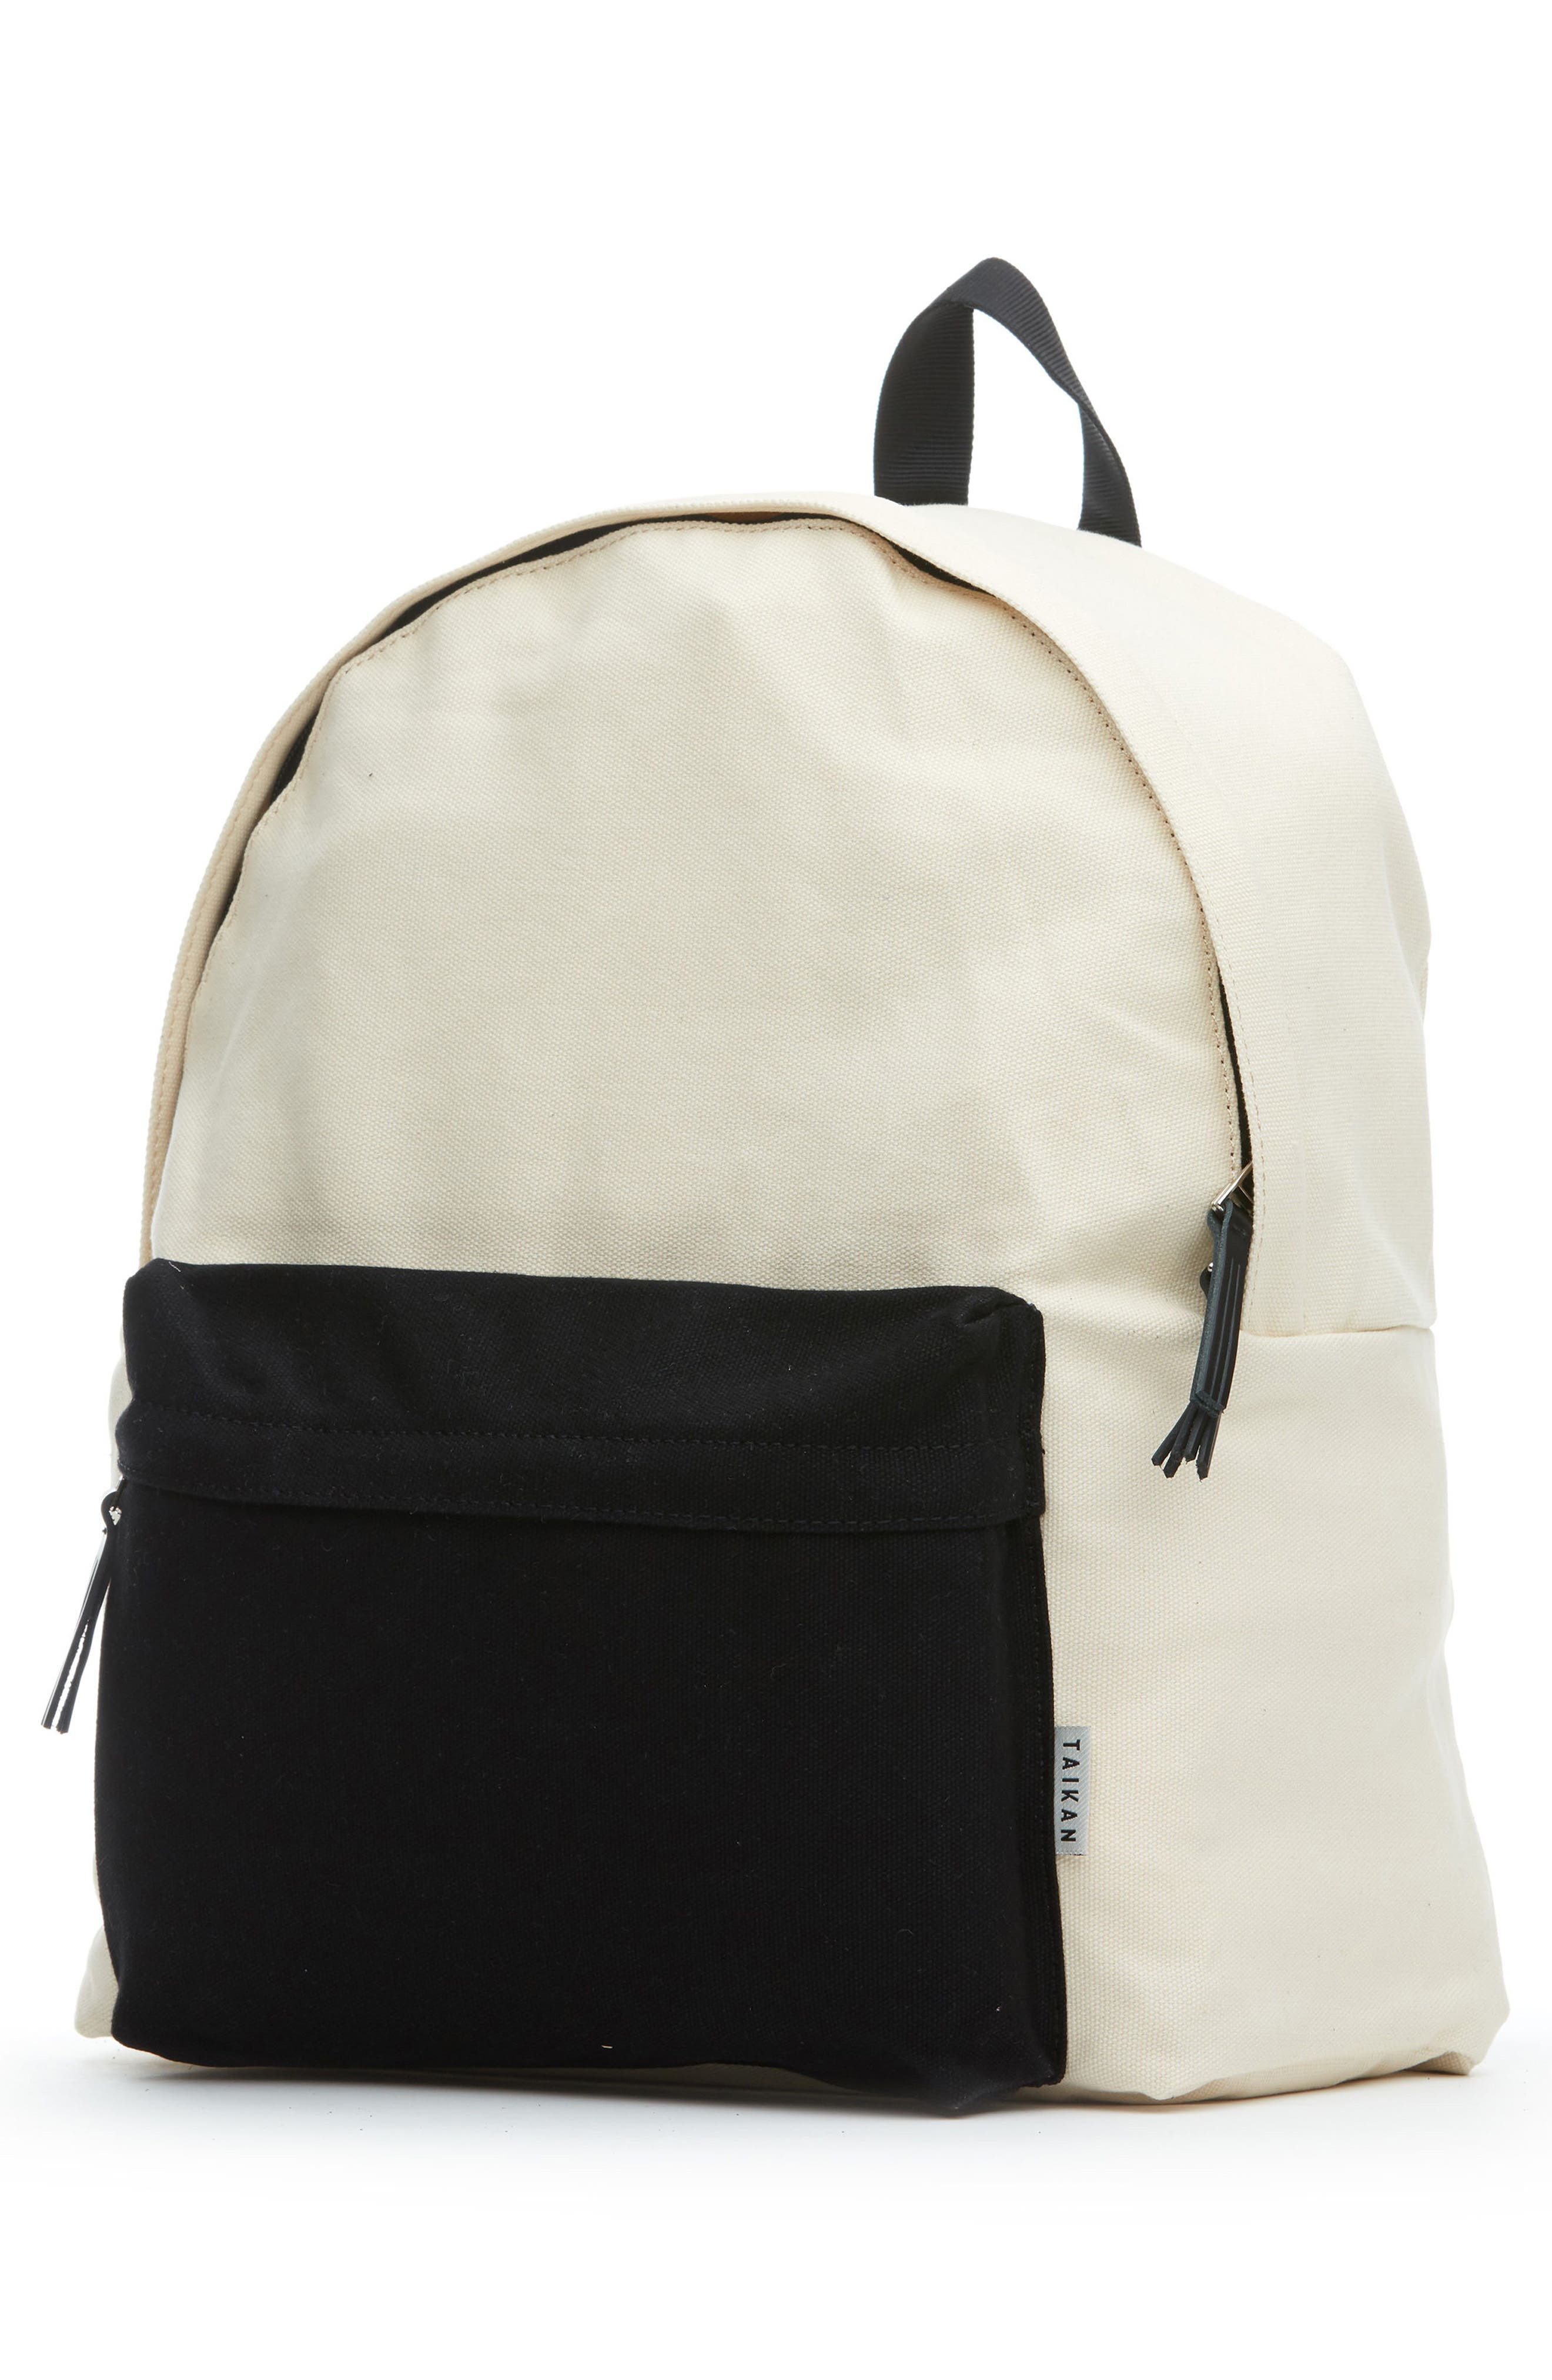 Hornet Backpack,                             Alternate thumbnail 2, color,                             Natural Cotton